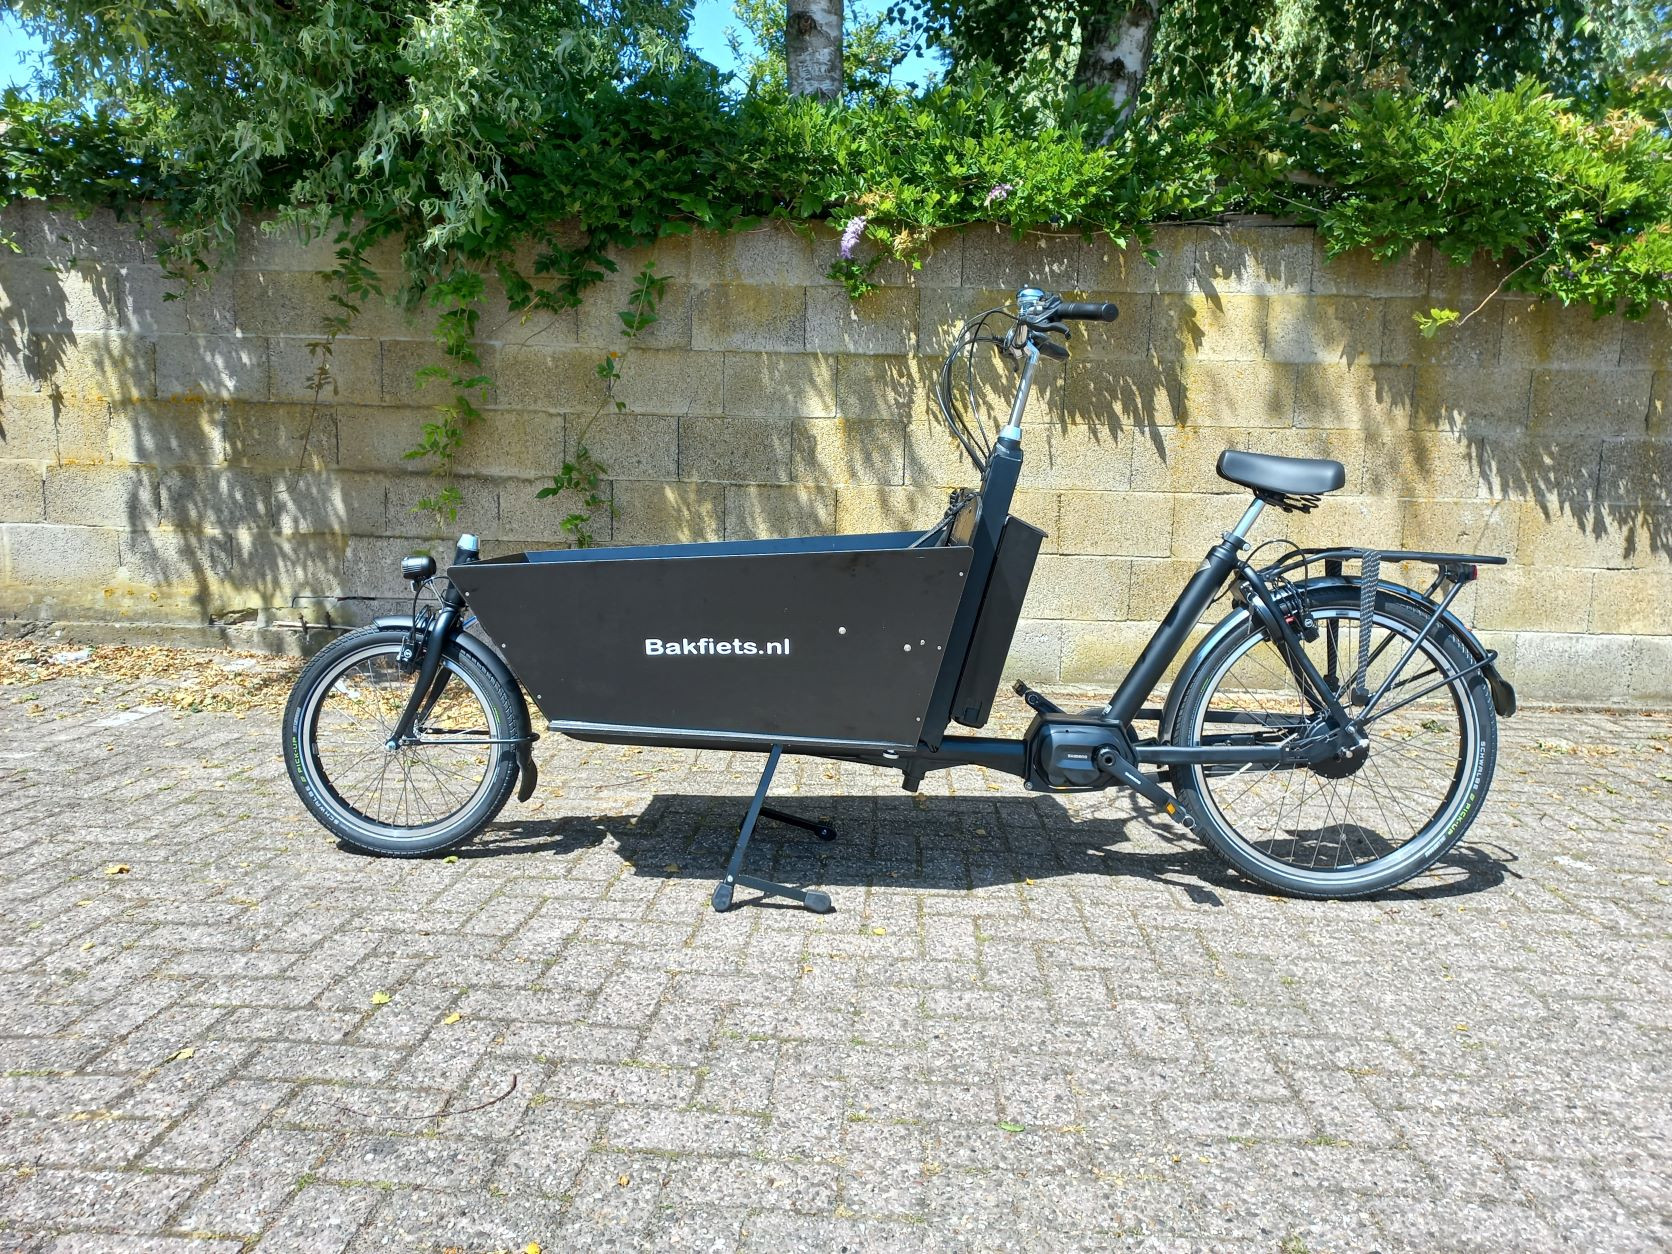 Elektrische bakfiets.nl Cargobike Classic Long Steps (voorraad model)